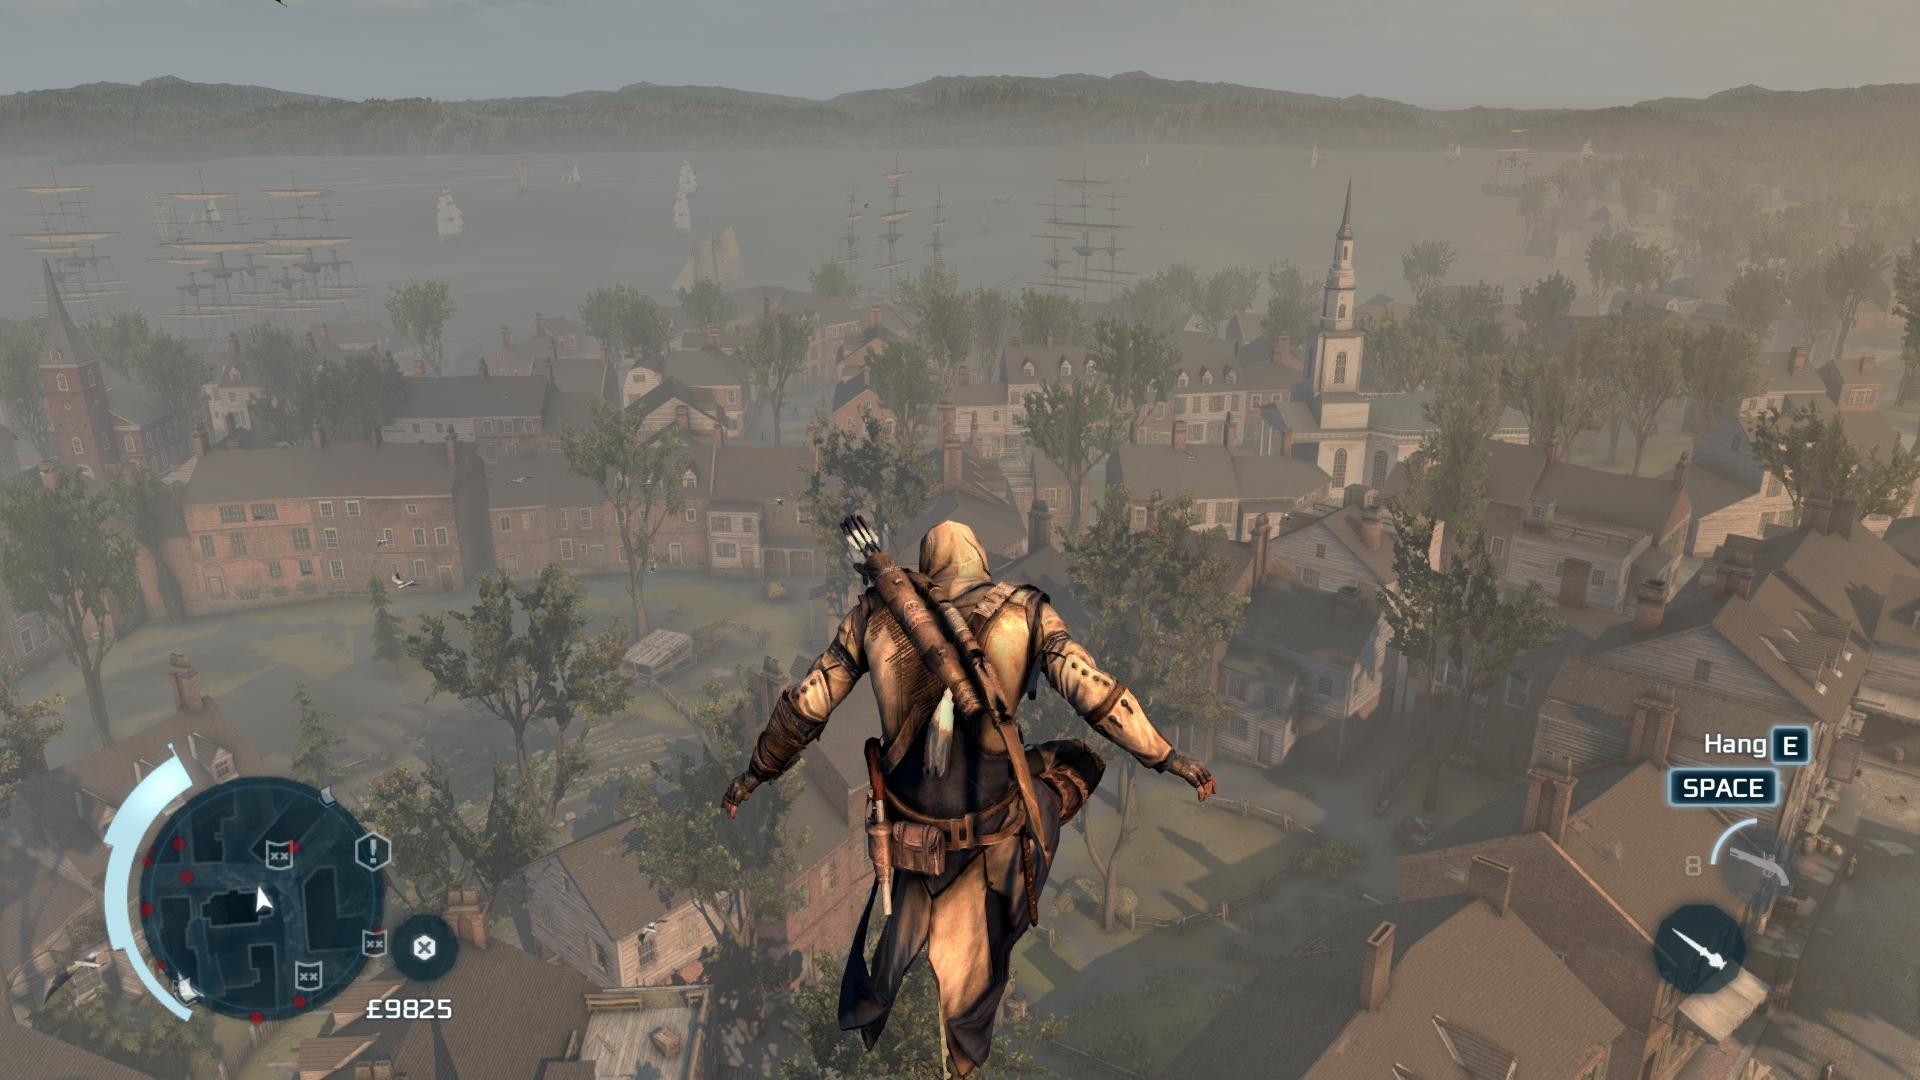 Screenshots Boston Assassins Creed 3 Indian Native American